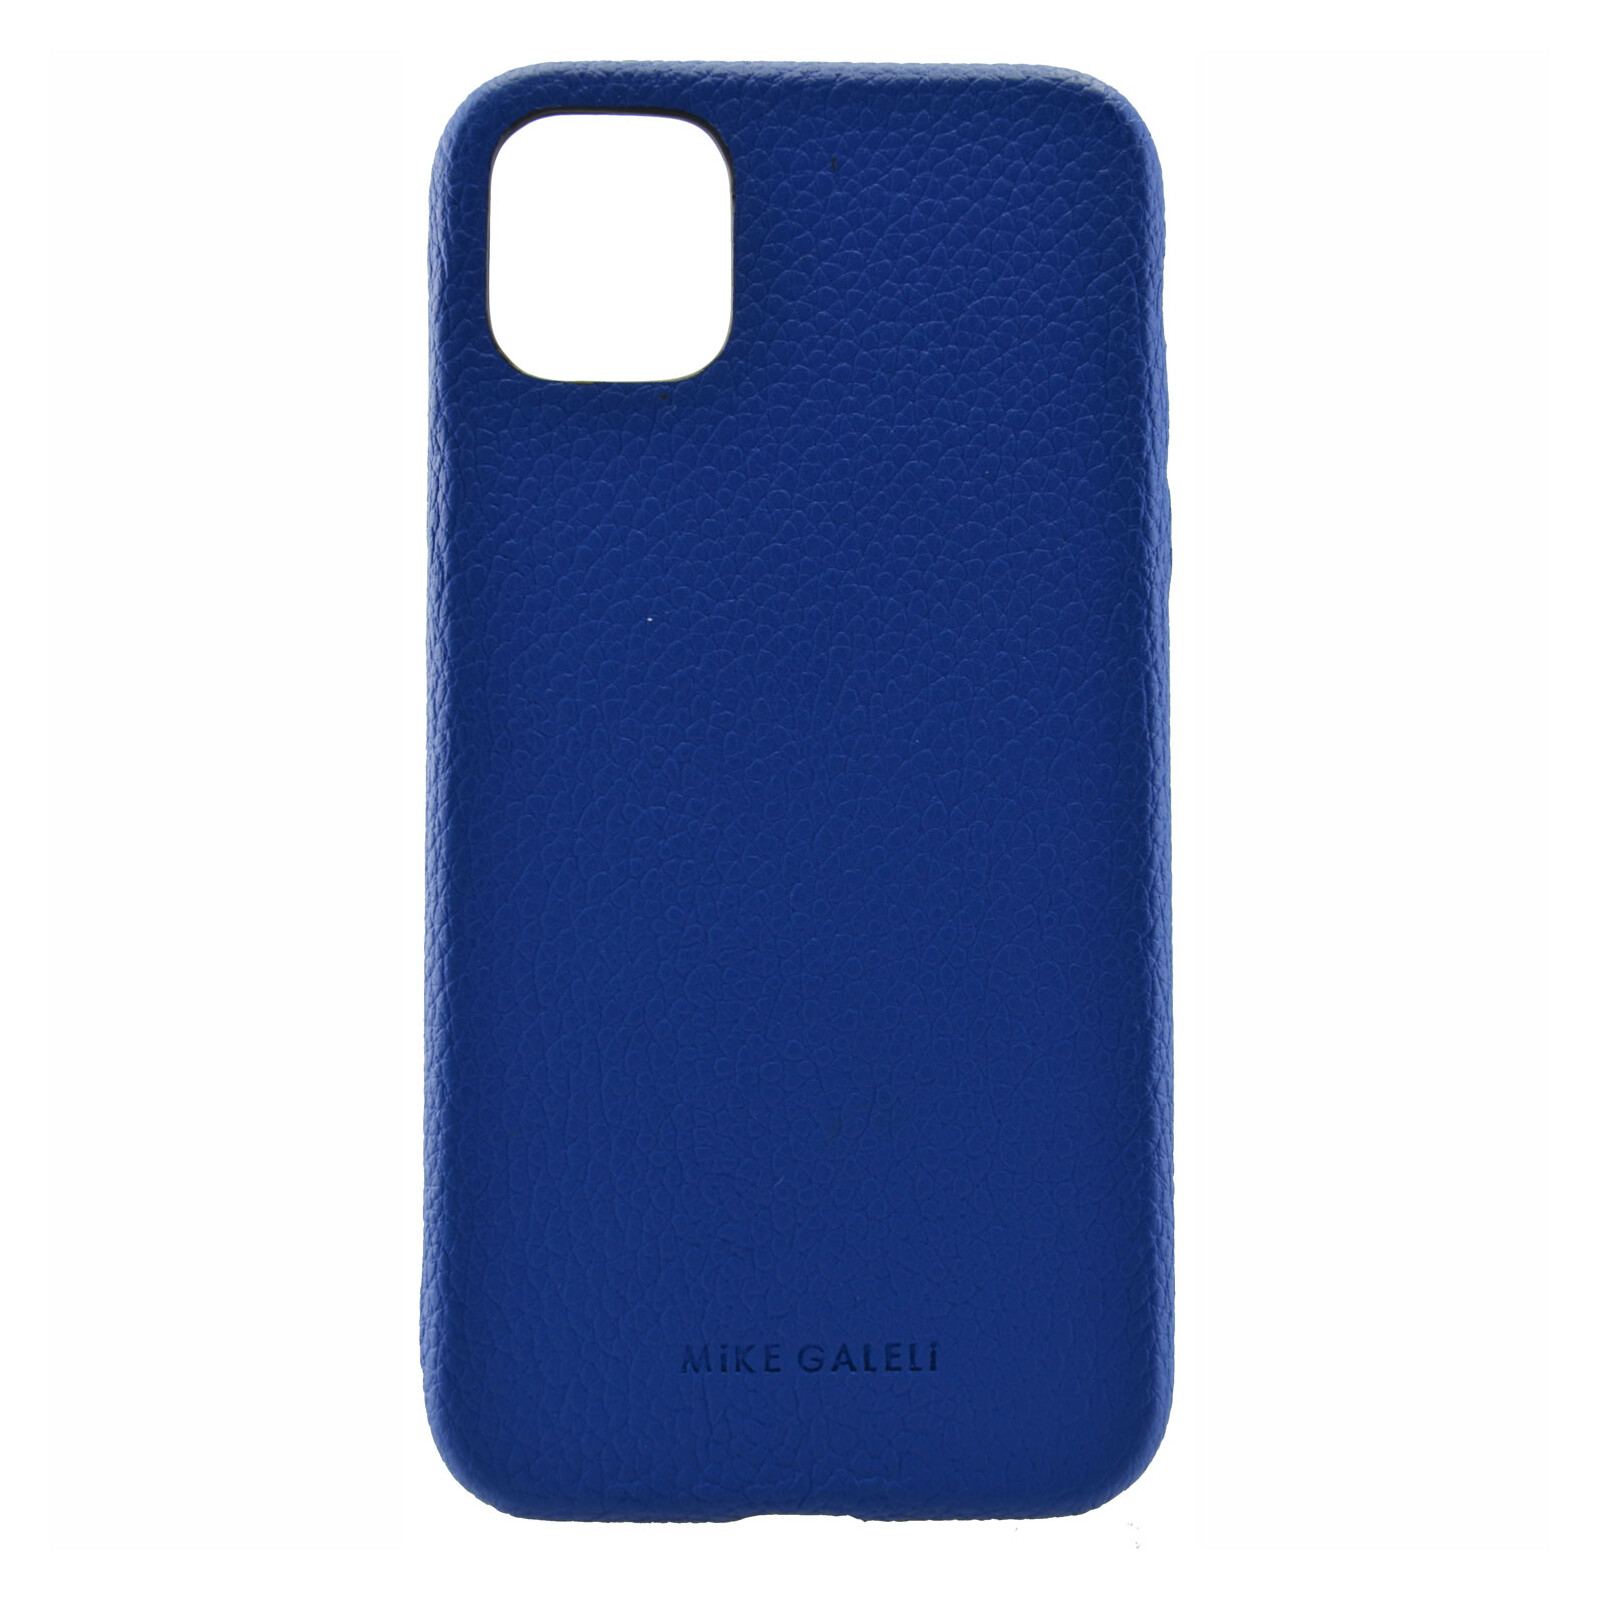 Galeli Backcover FINN Apple iPhone 12 true blue